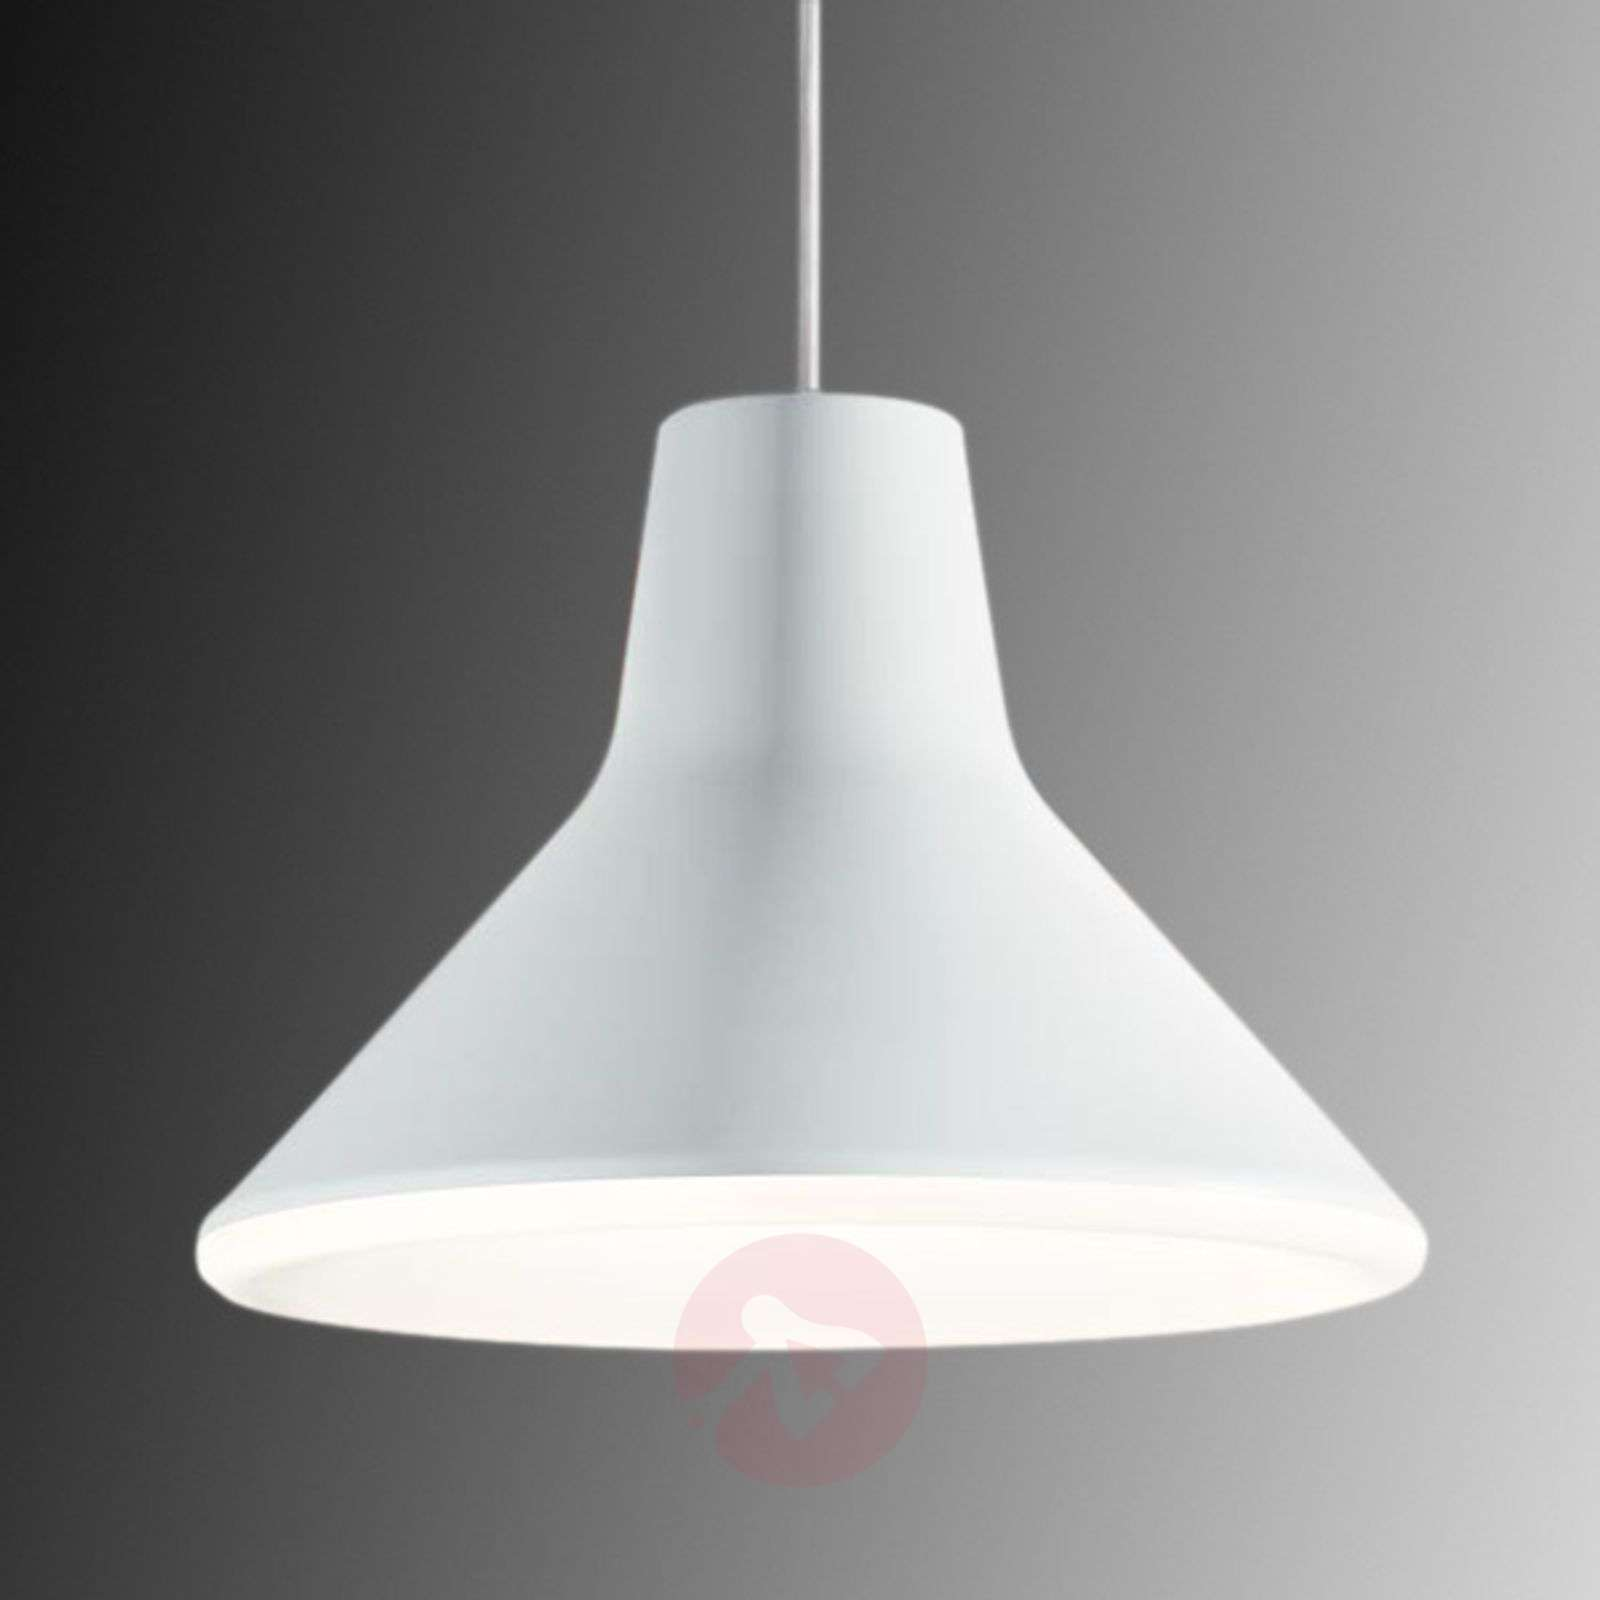 White led designer pendant light archetype lights white led designer pendant light archetype 6030025 01 aloadofball Images